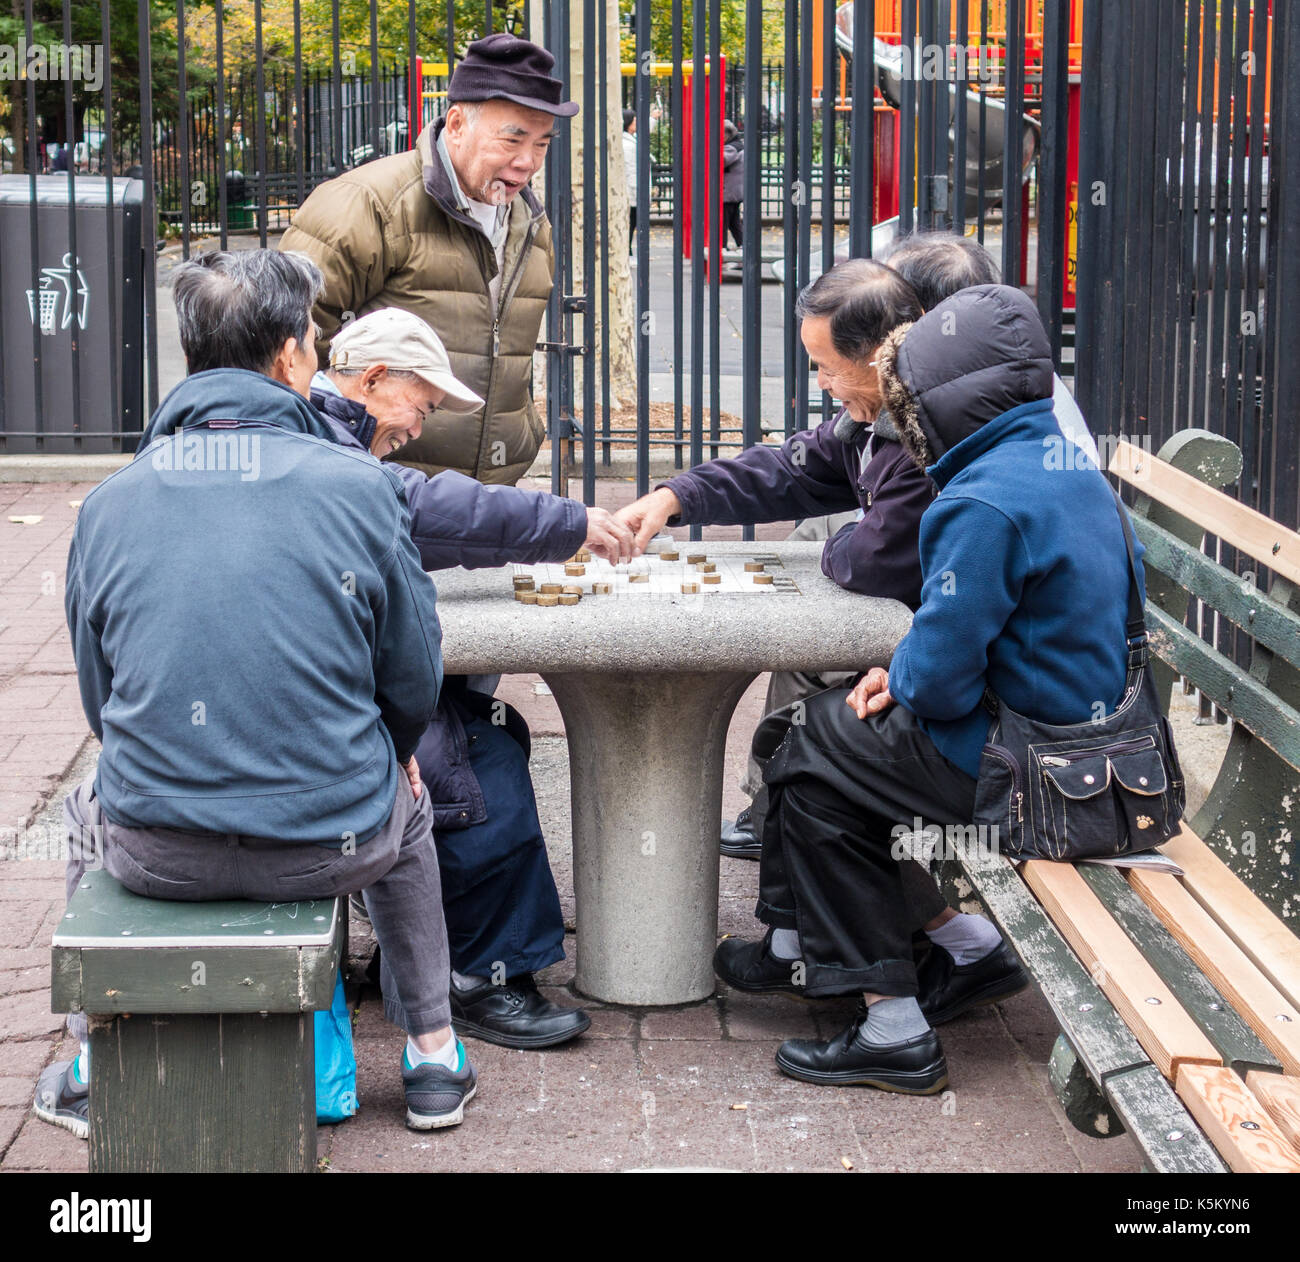 New York City, New York - Nov 5, 2014: Men play mahjong in Chinatown park - Stock Image